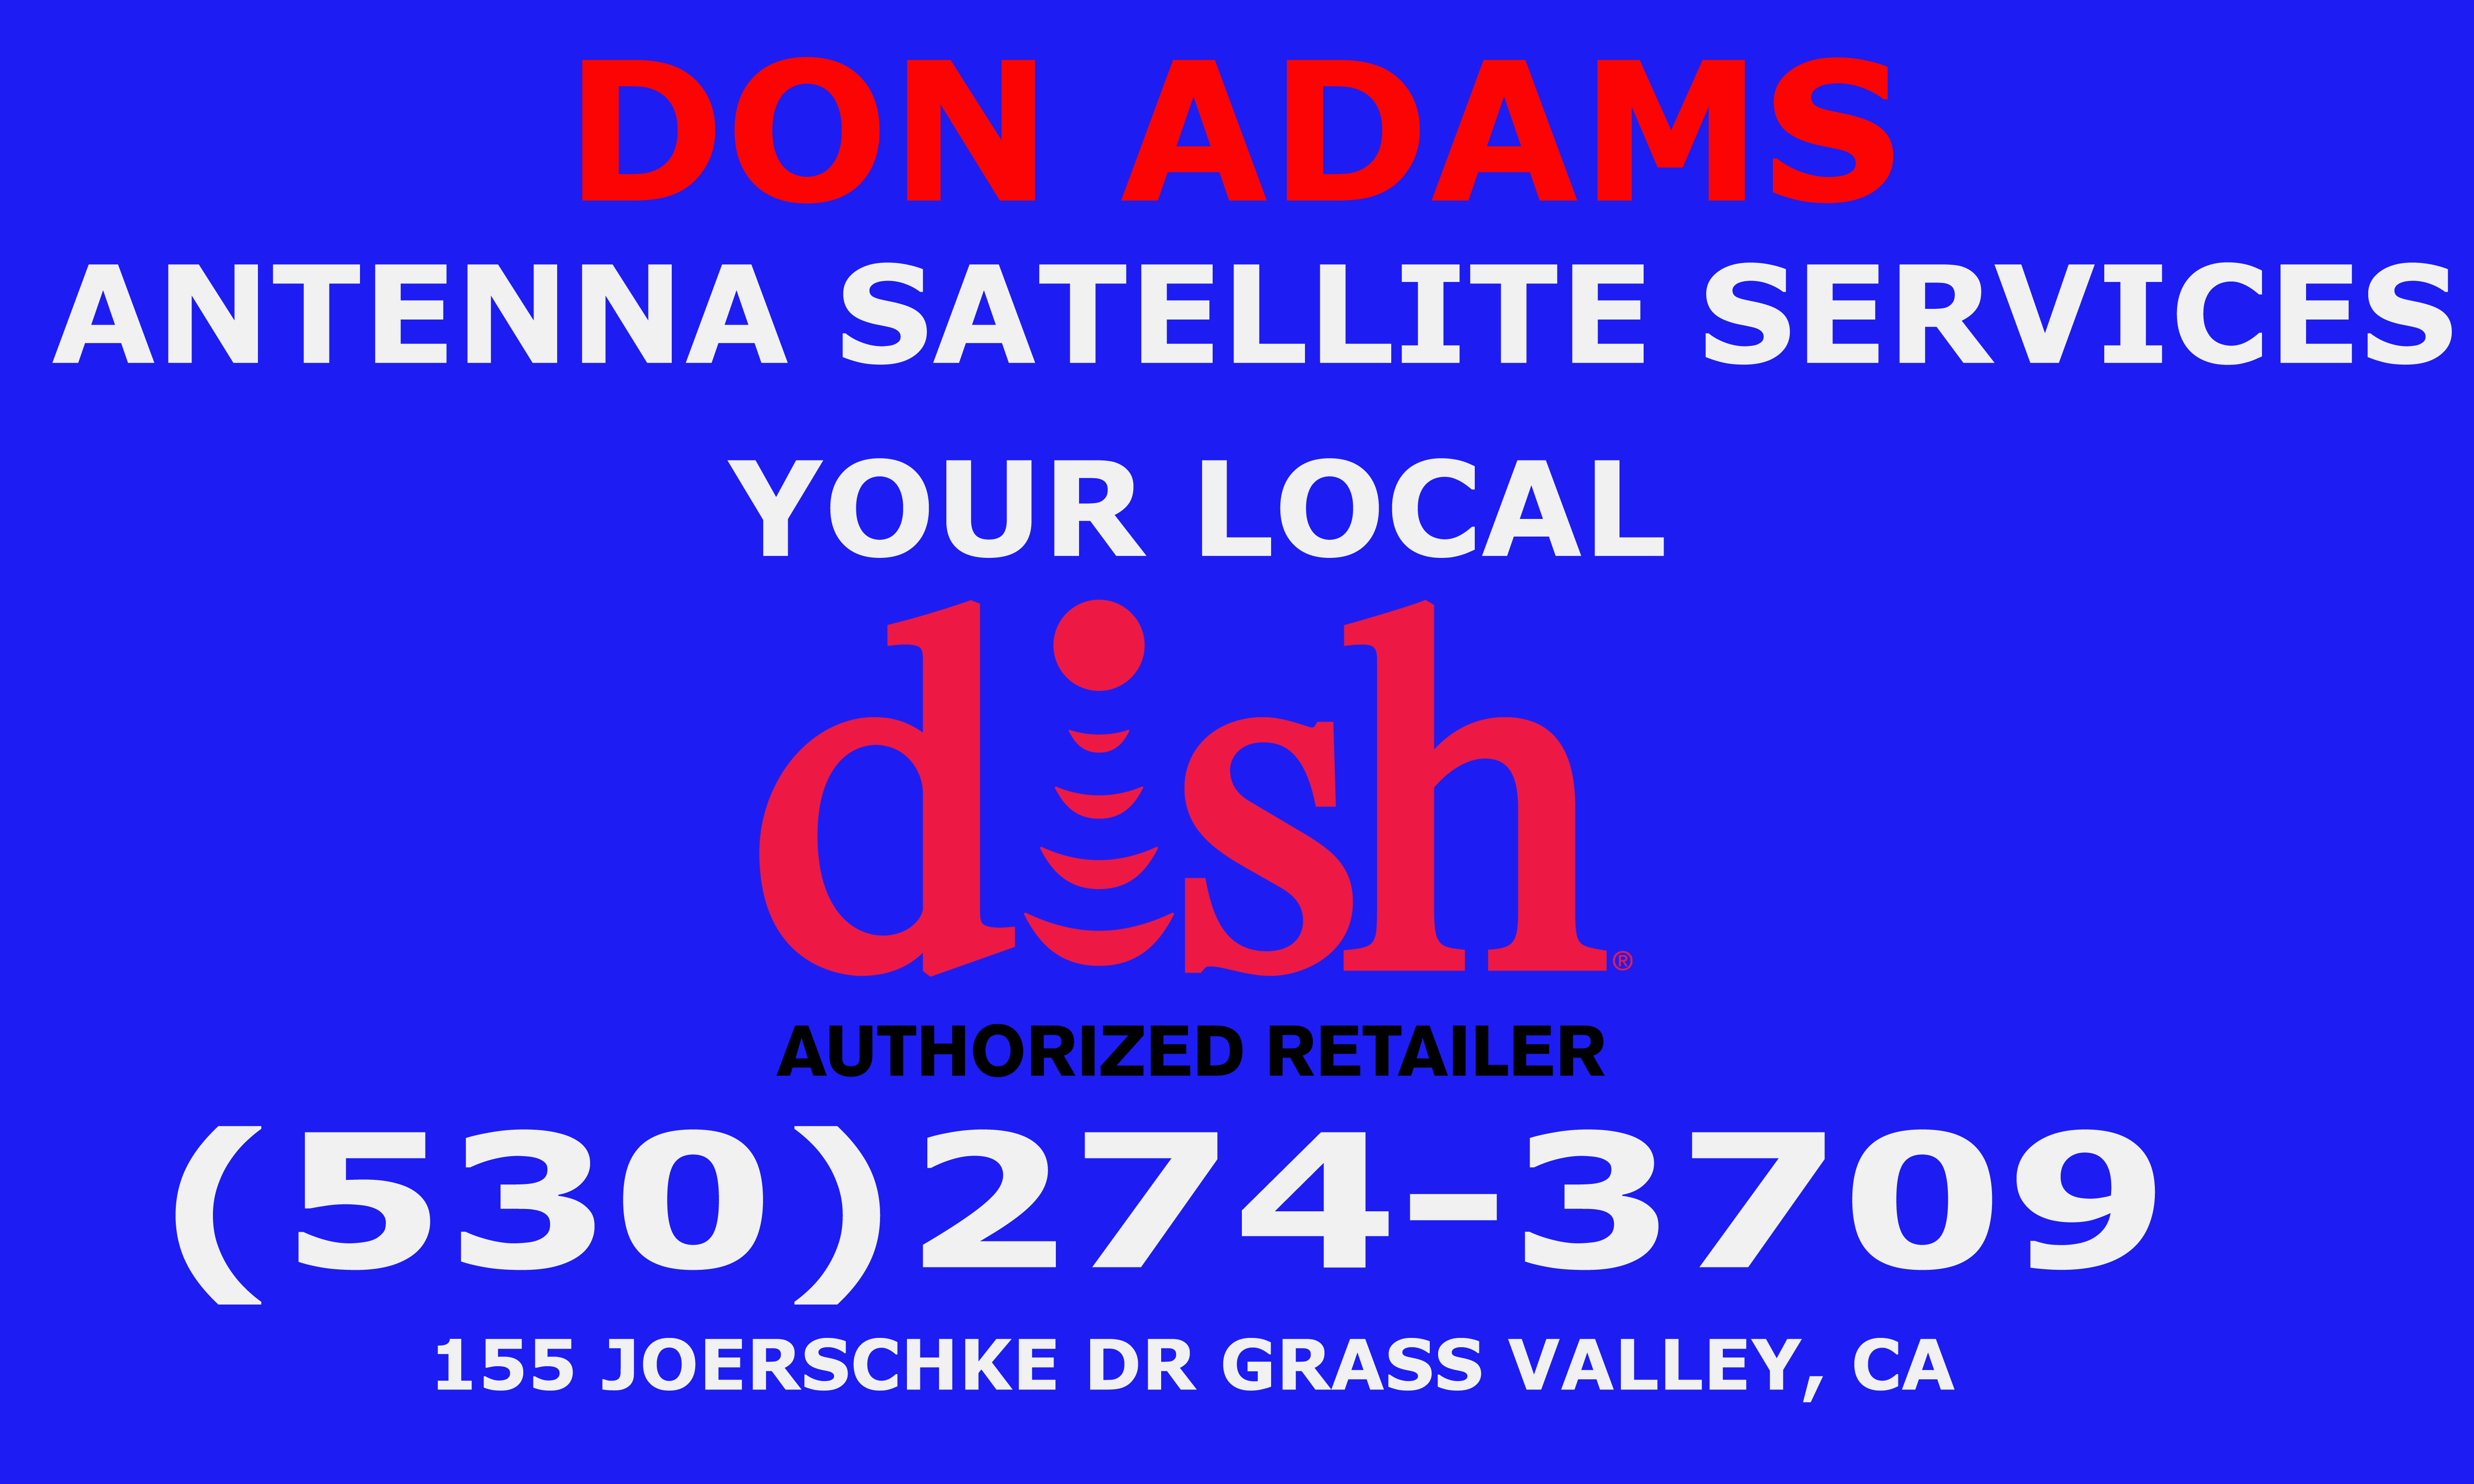 Don Adams Antenna Satellite Services